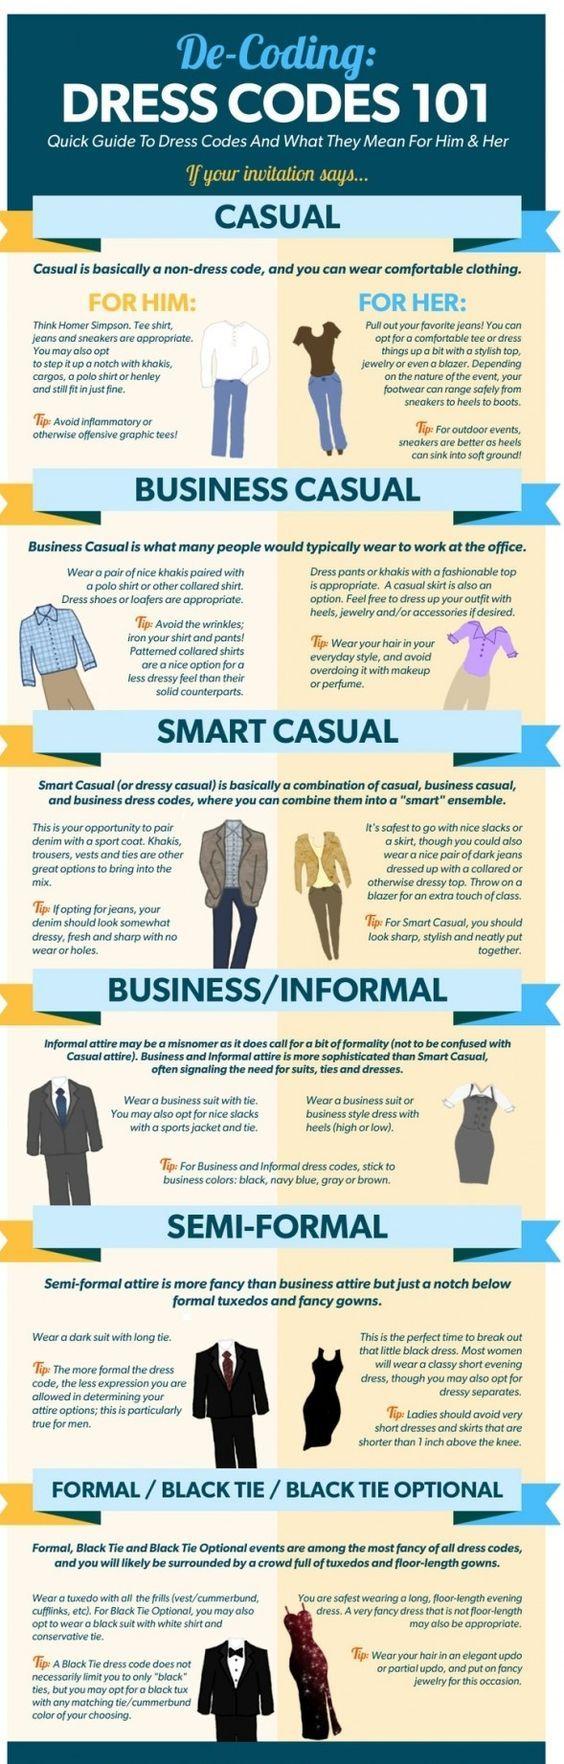 Dress Code 101: